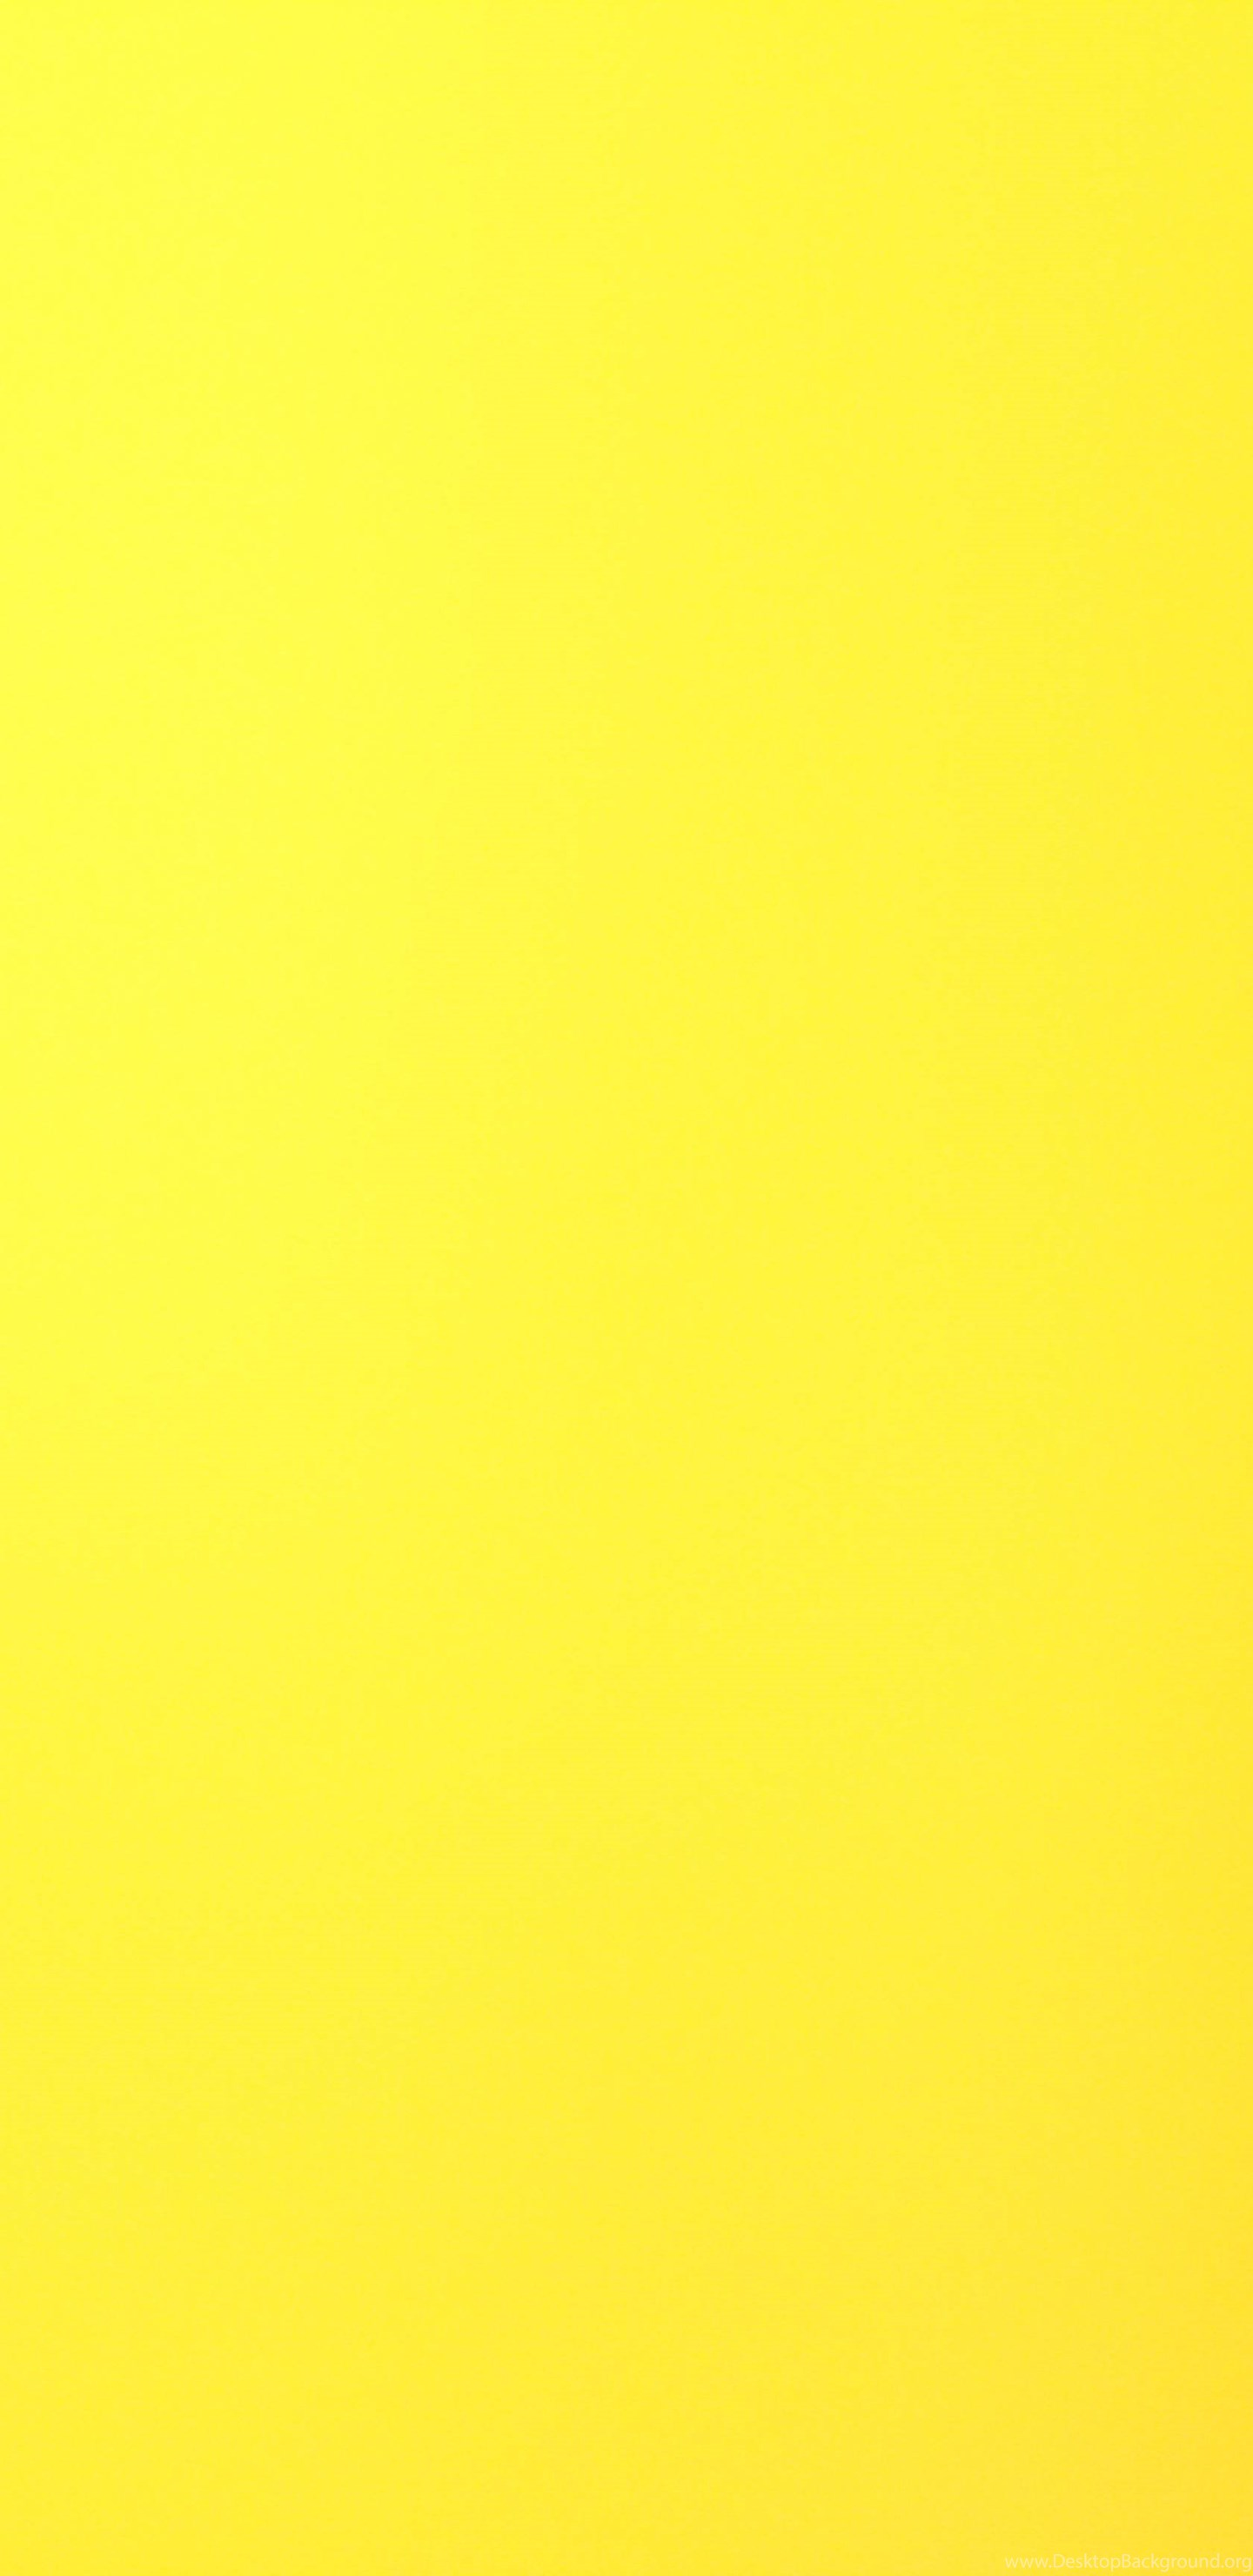 Yellow Wallpaper Hd Wsp015 Desktop Background